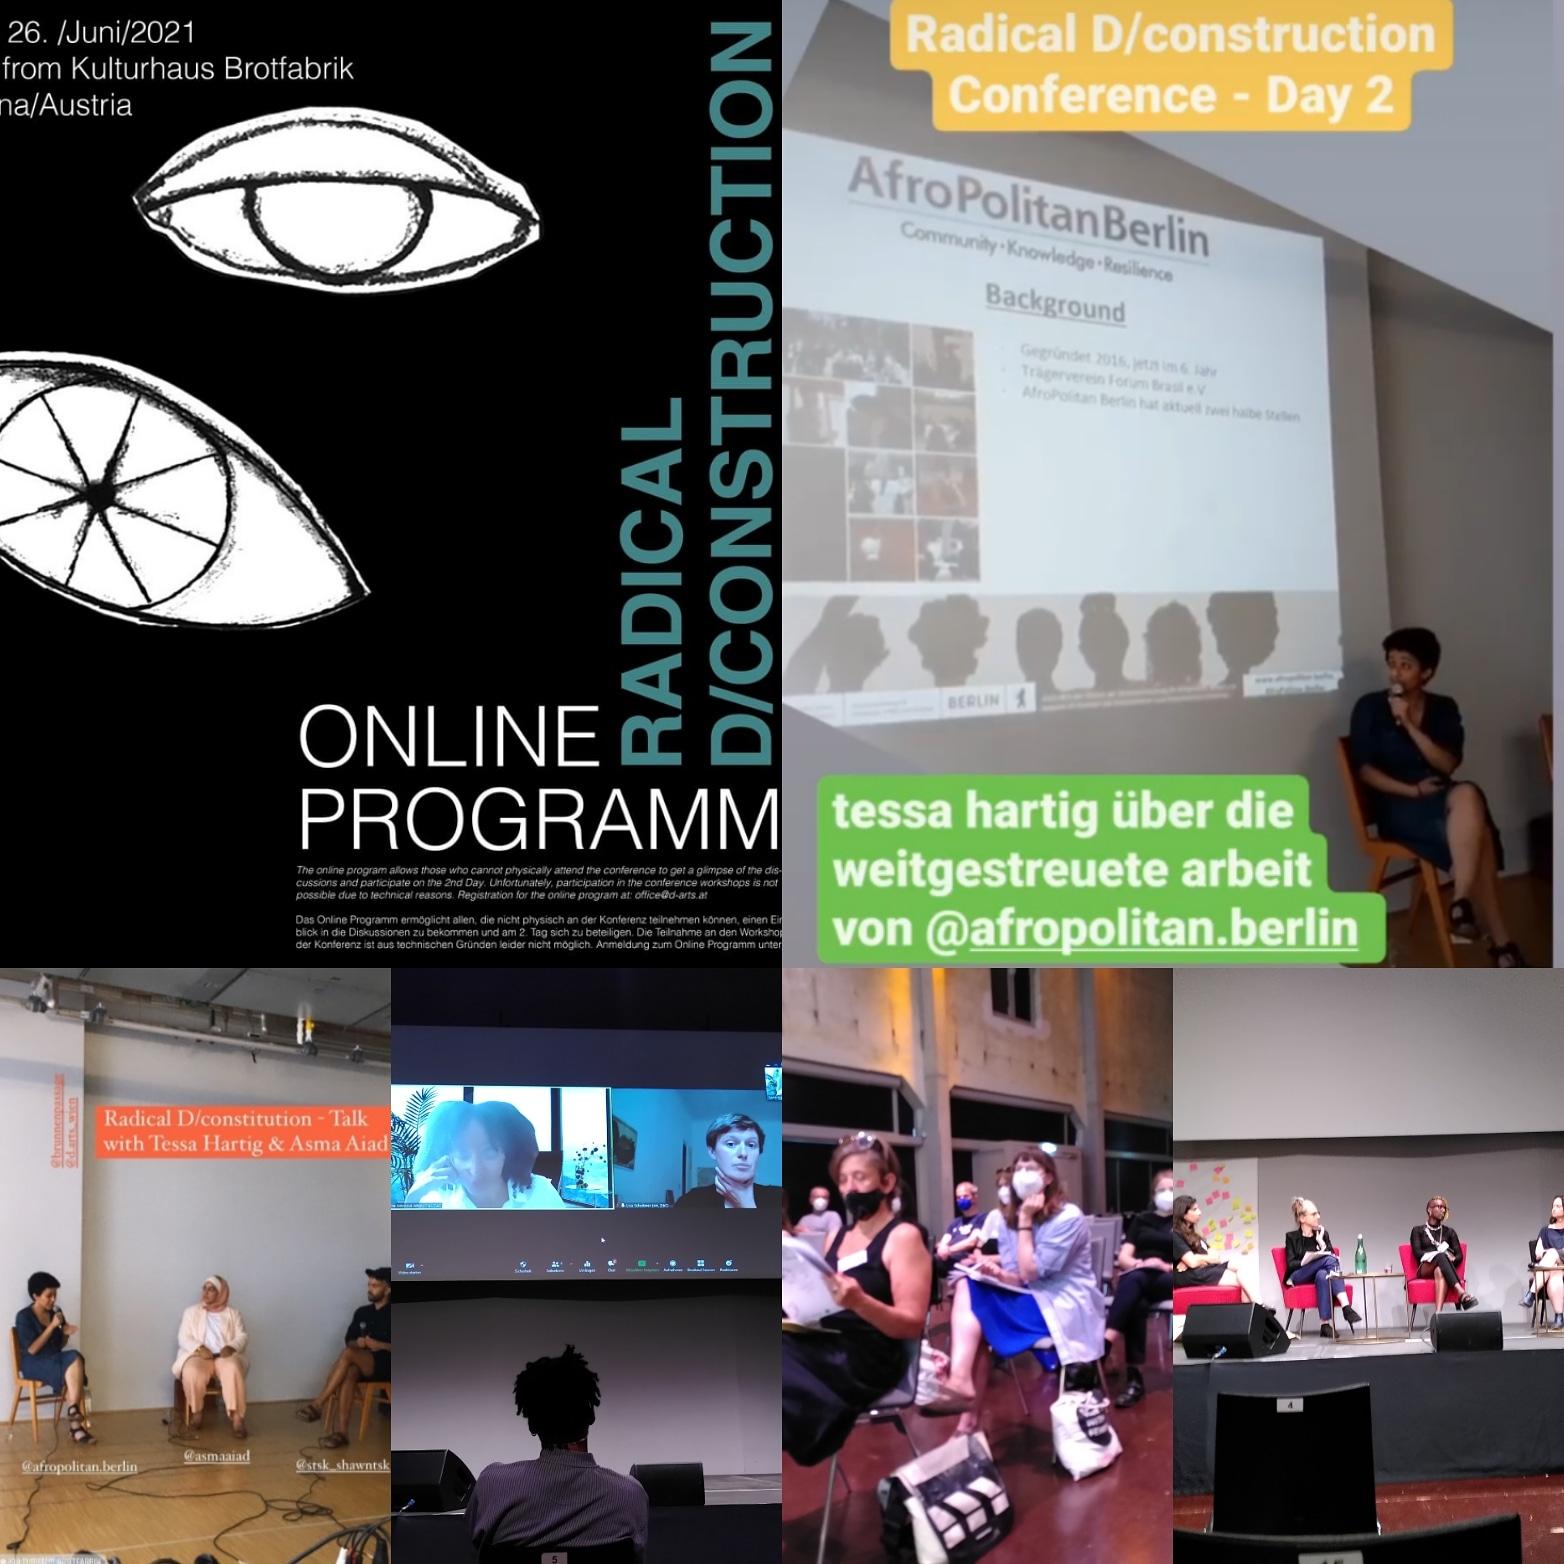 Radical D/Construction Konferenz in Wien